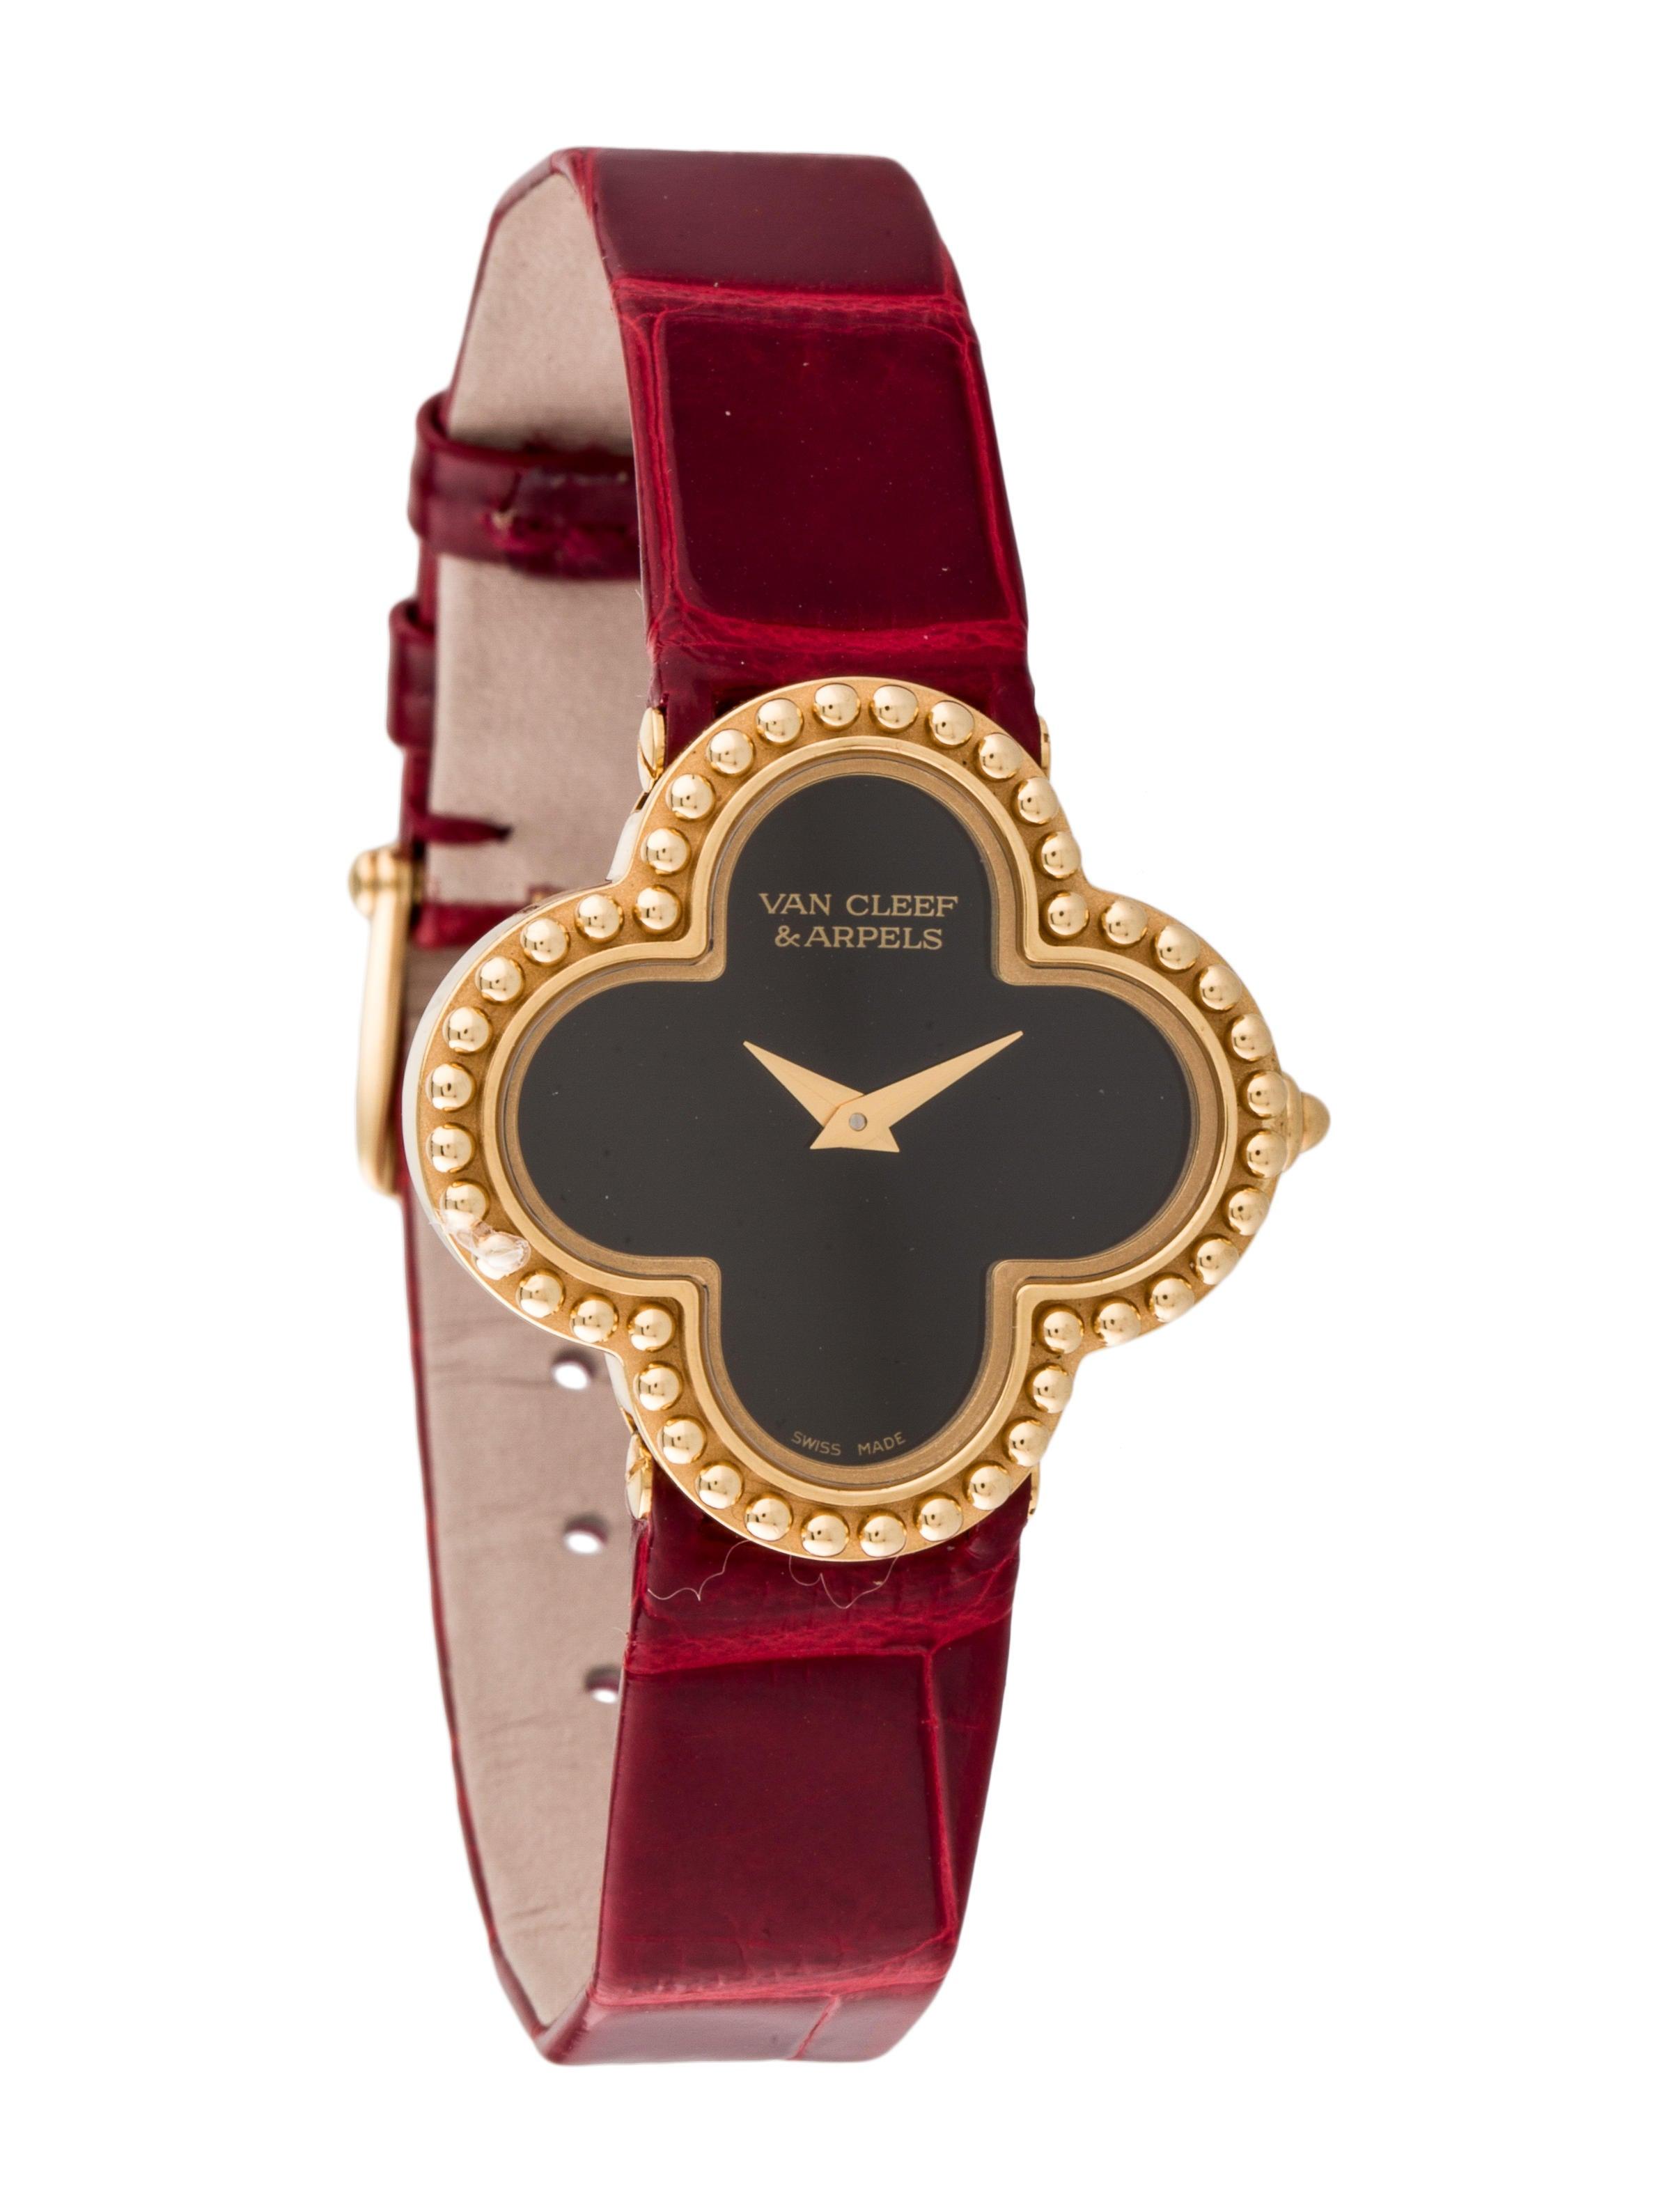 van cleef arpels vintage alhambra watch strap vac20483 the realreal. Black Bedroom Furniture Sets. Home Design Ideas